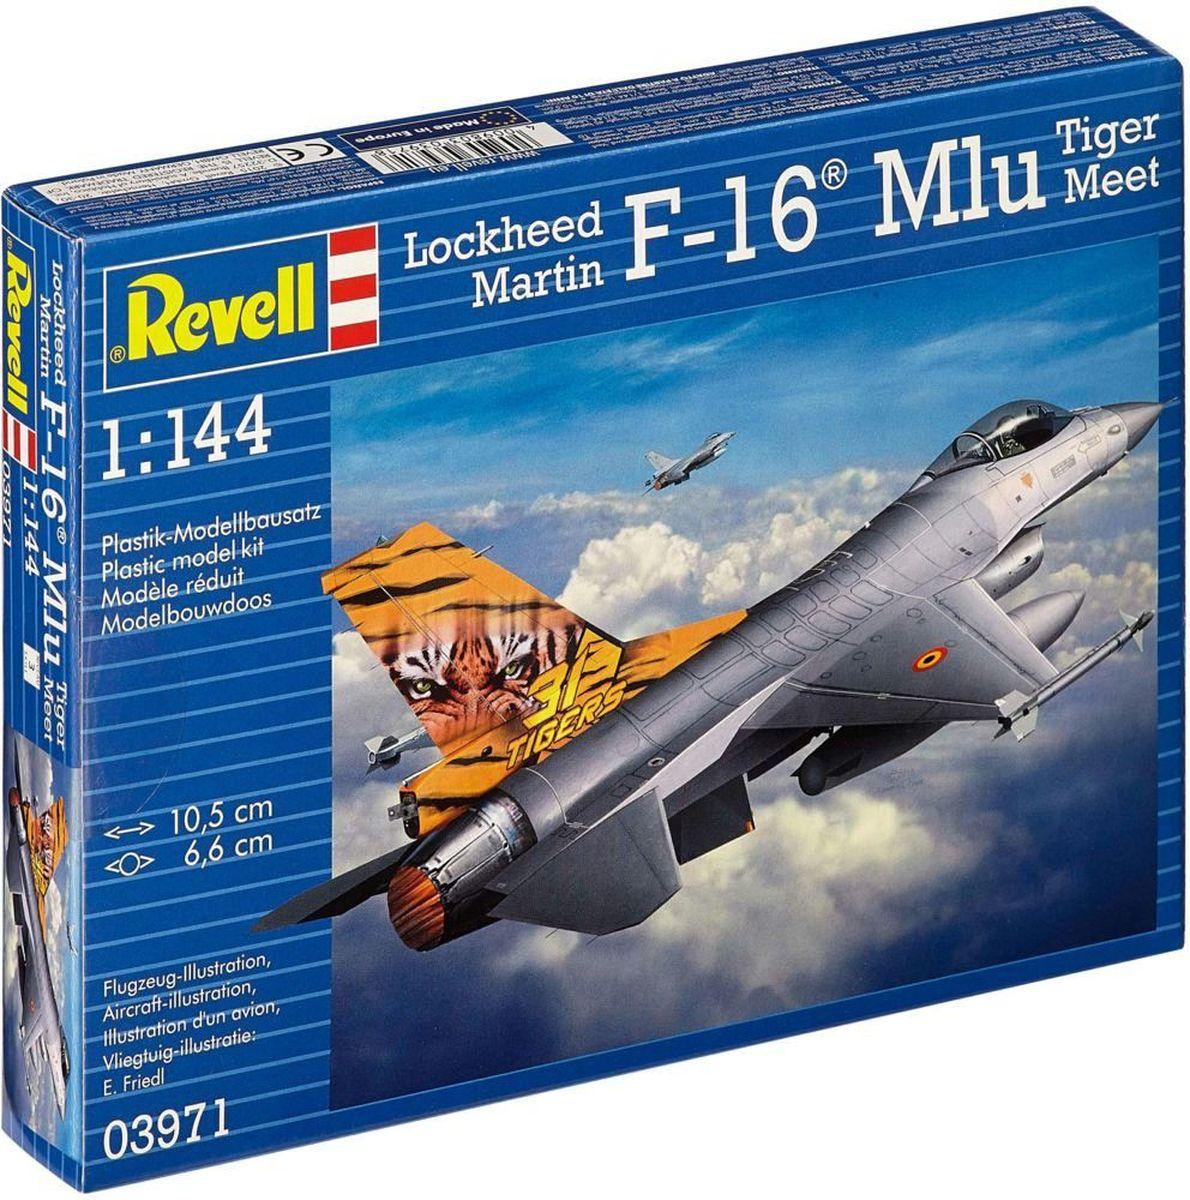 Revell Сборная модель Самолет Lockheed Martin F-16 Mlu Tiger Meet